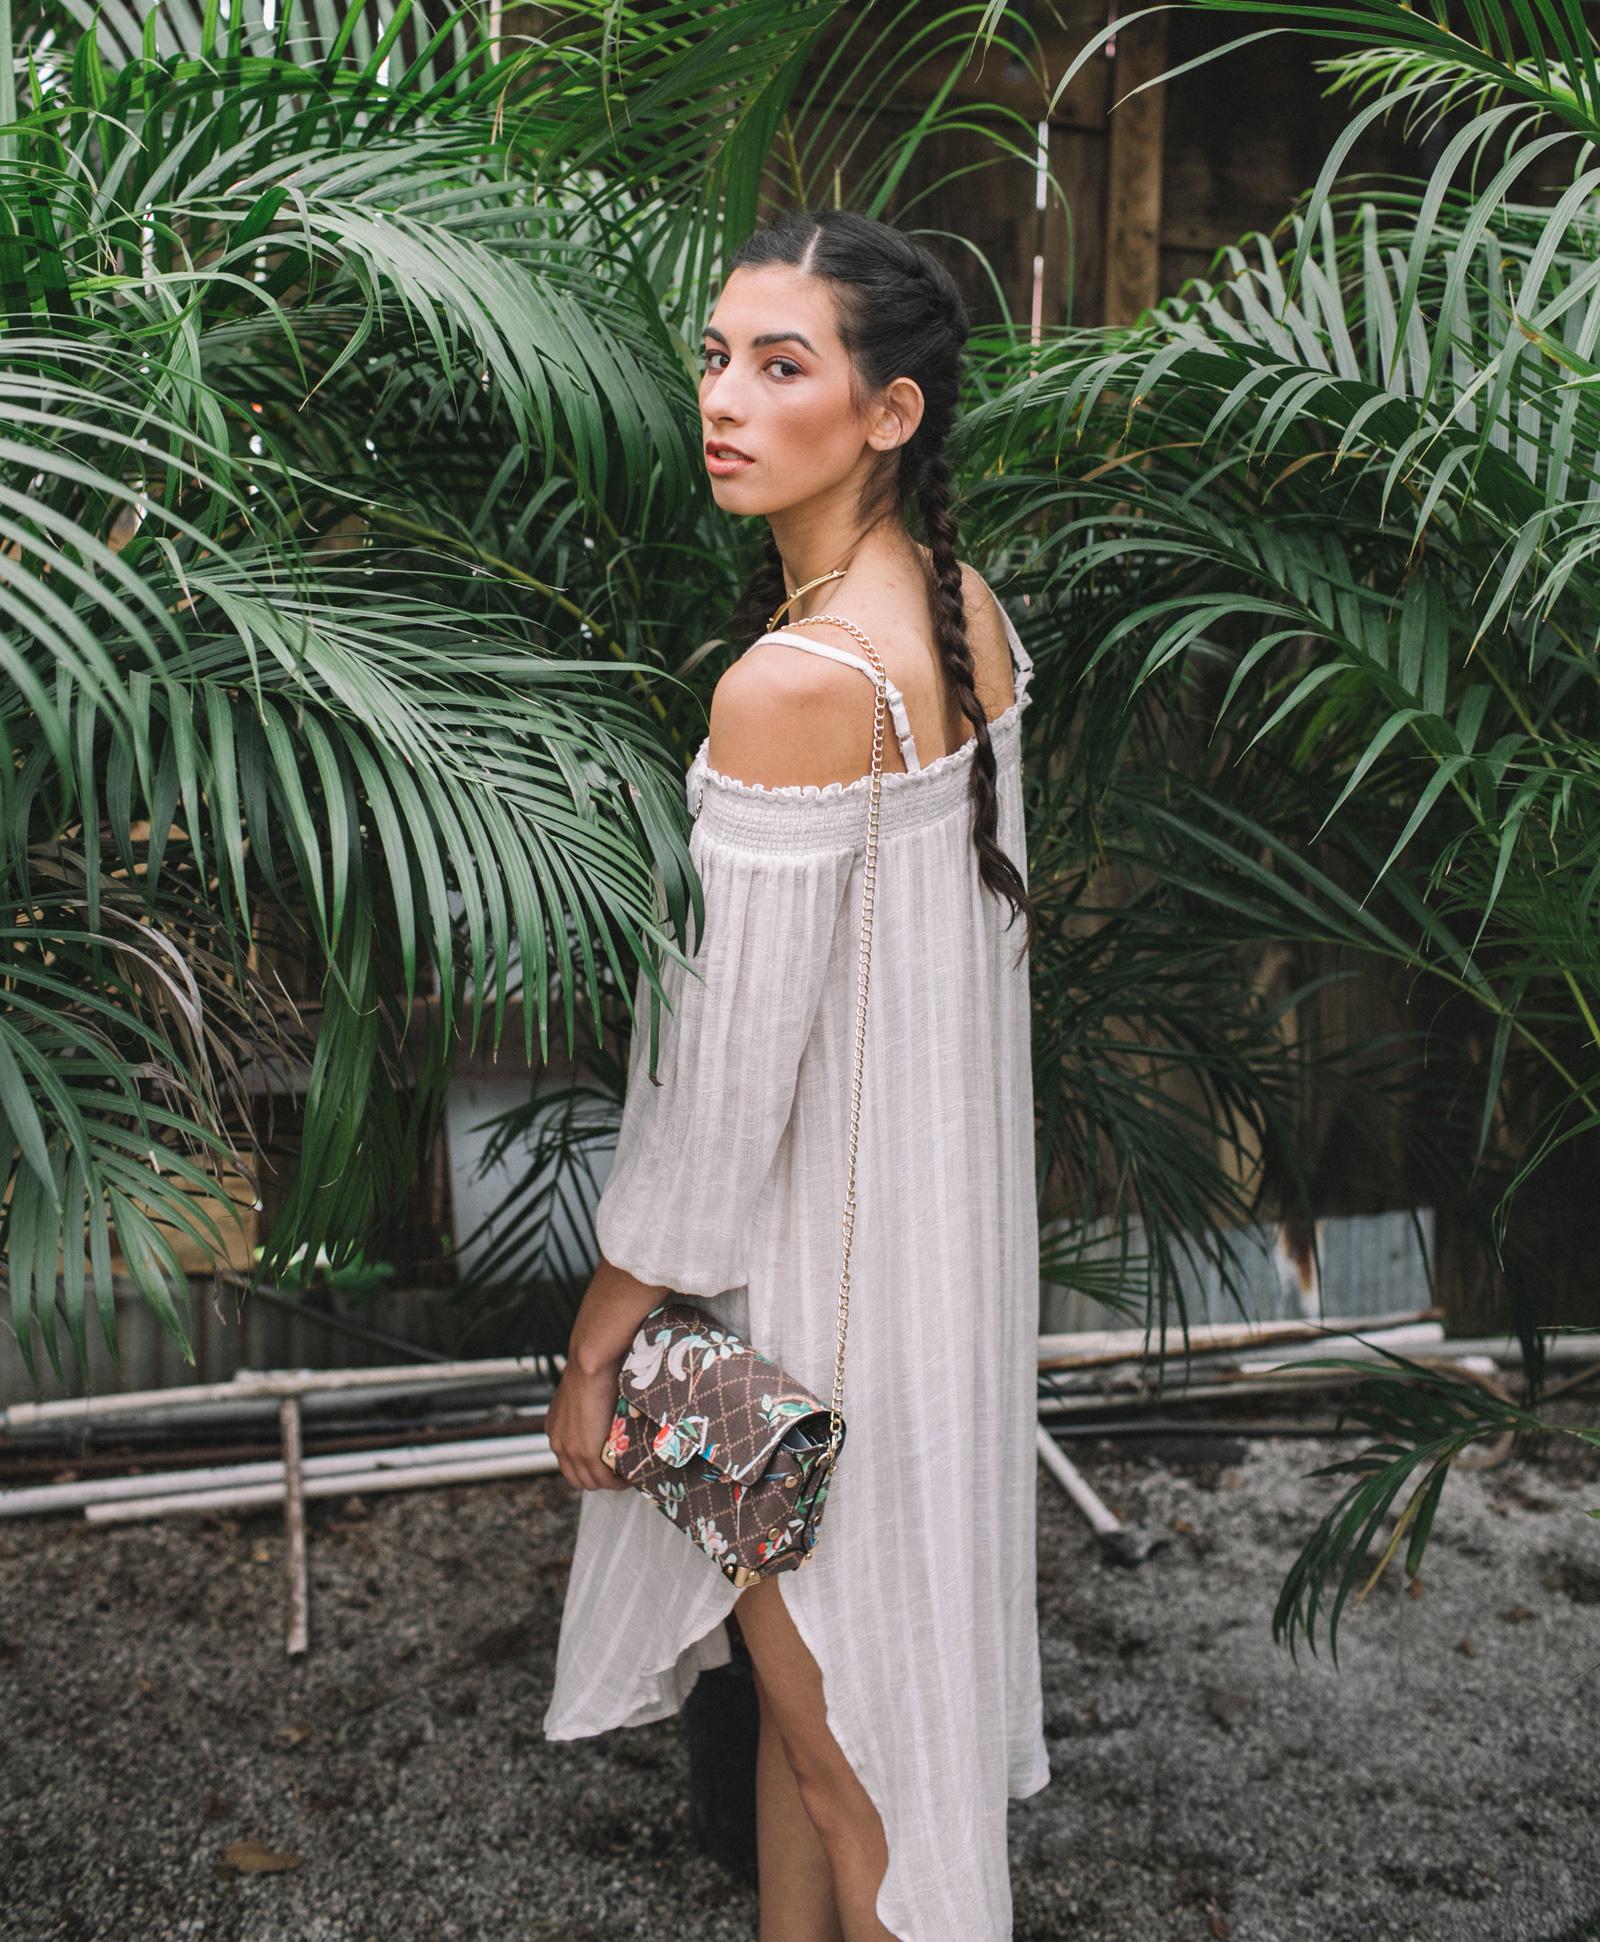 Salon Spring/Summer 2017 Lookbook New Orleans